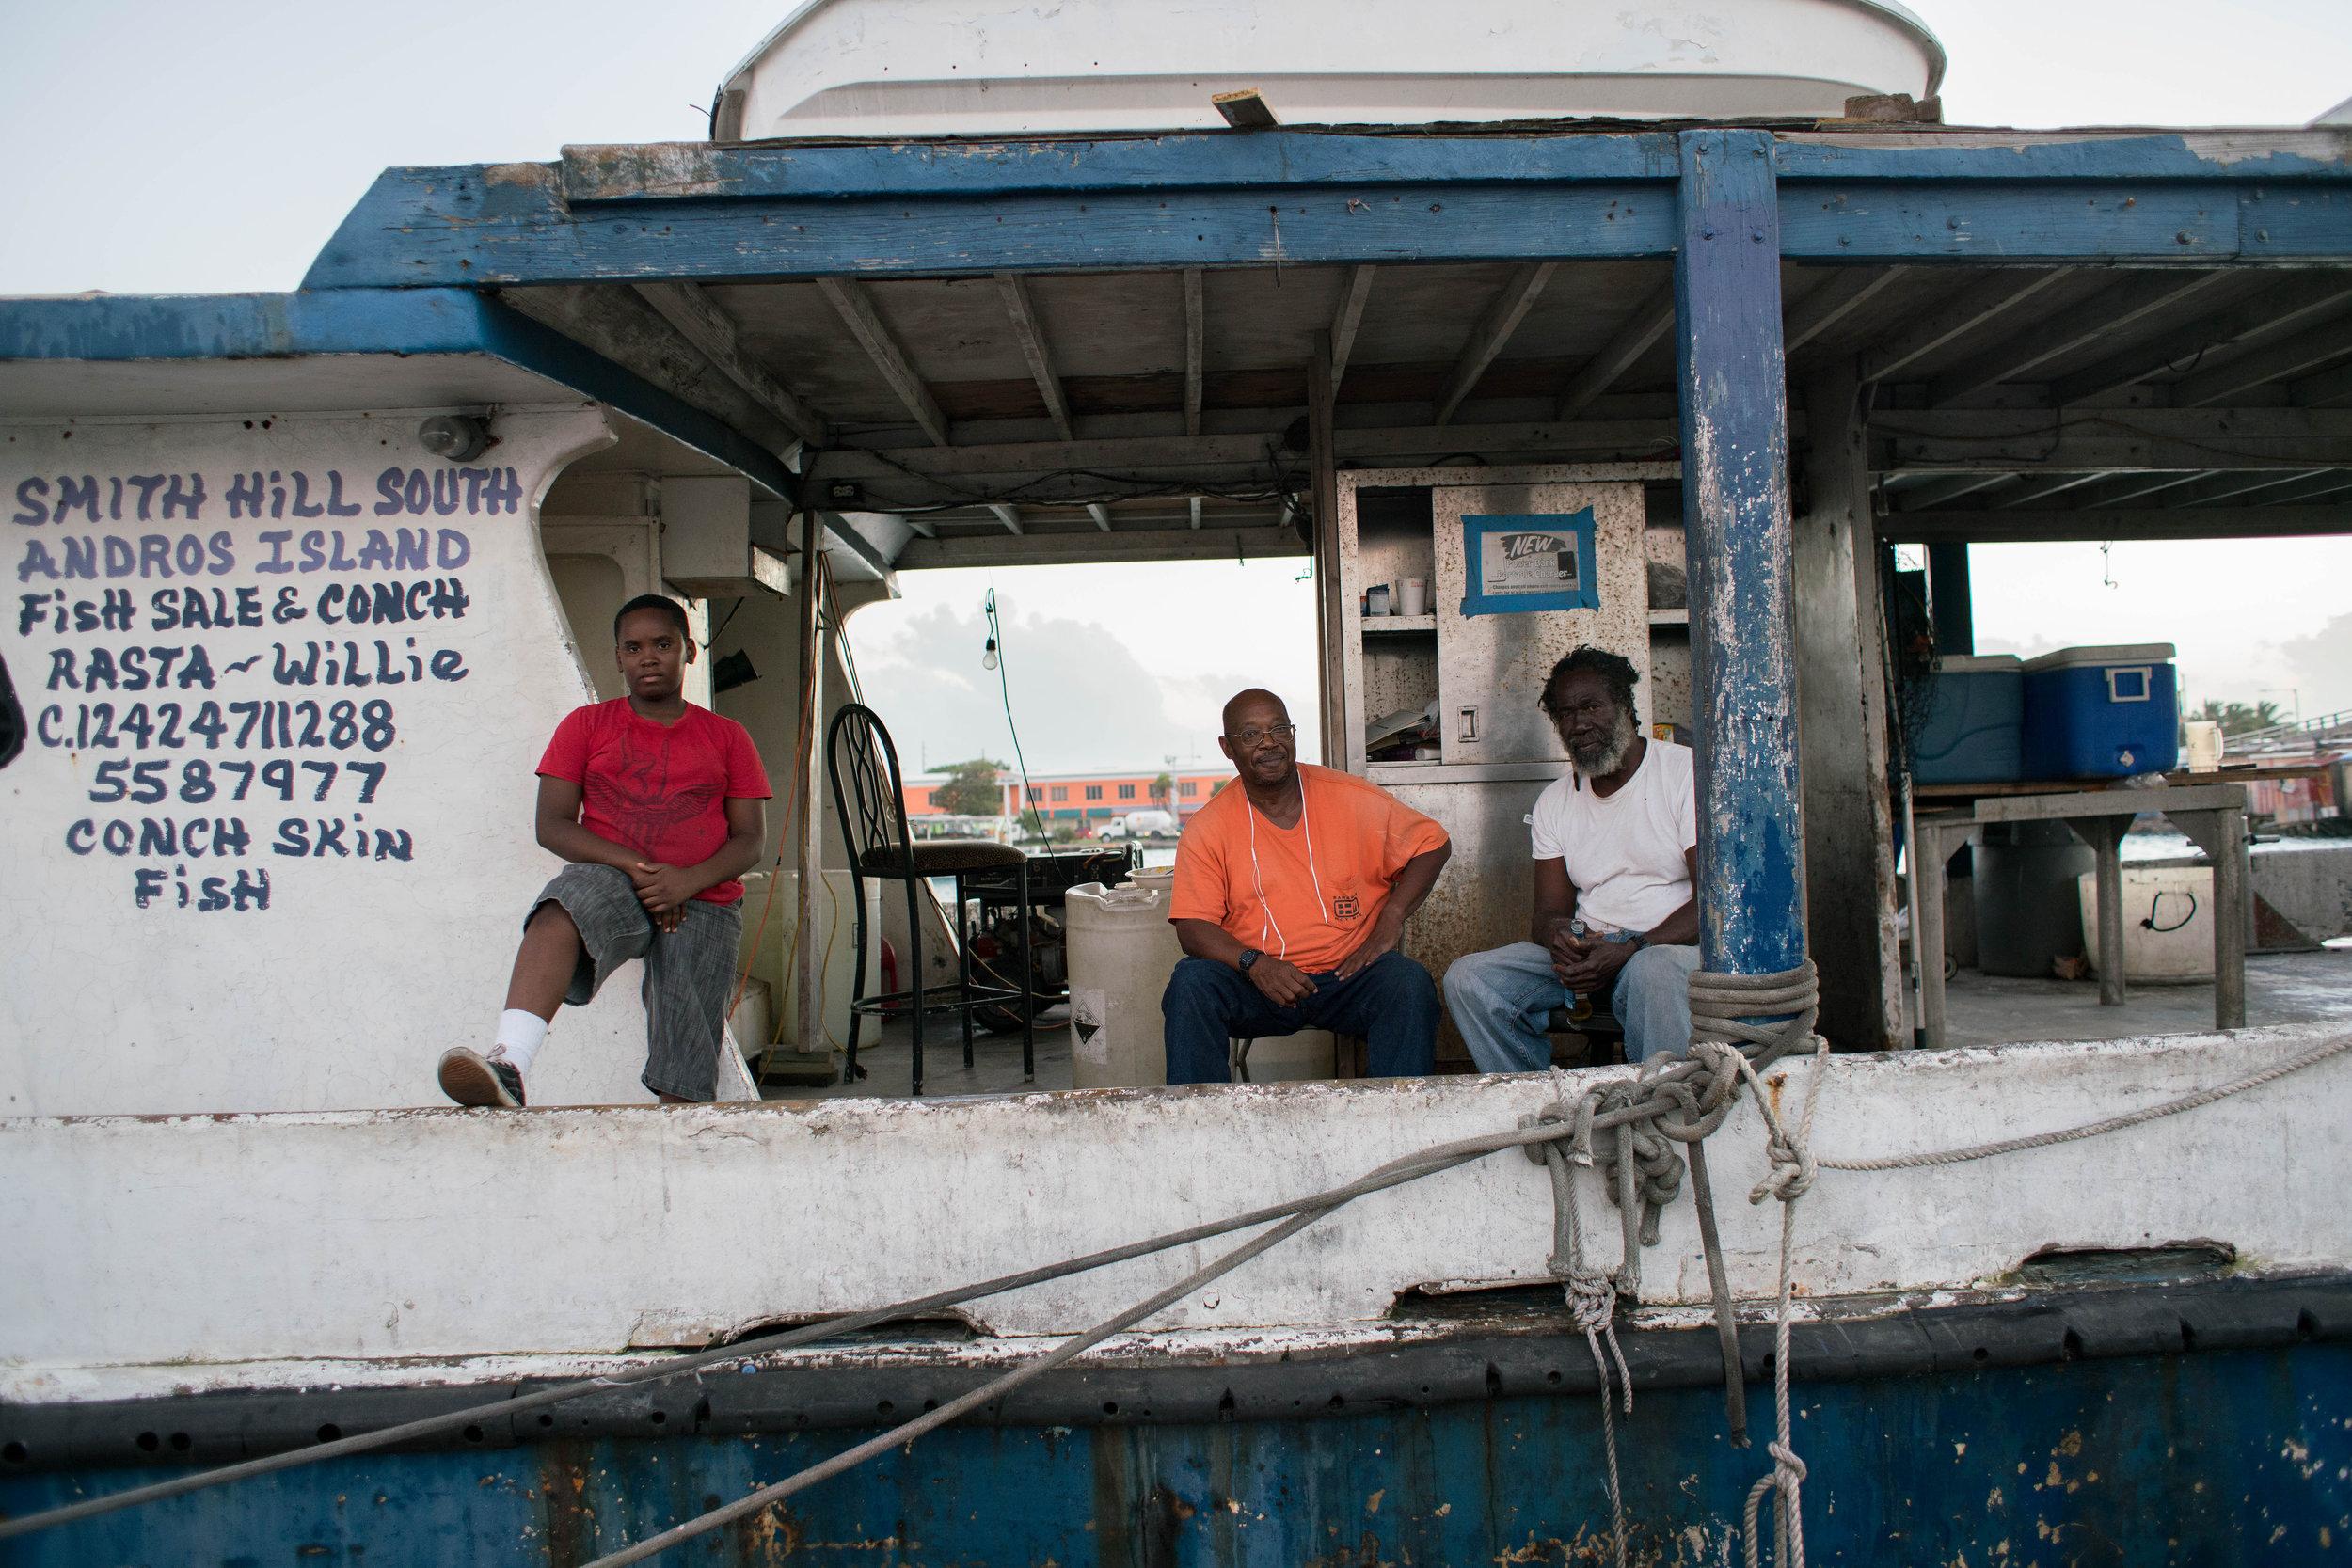 Tamika Galanis. Smith Hill Boat. Photography. 2016